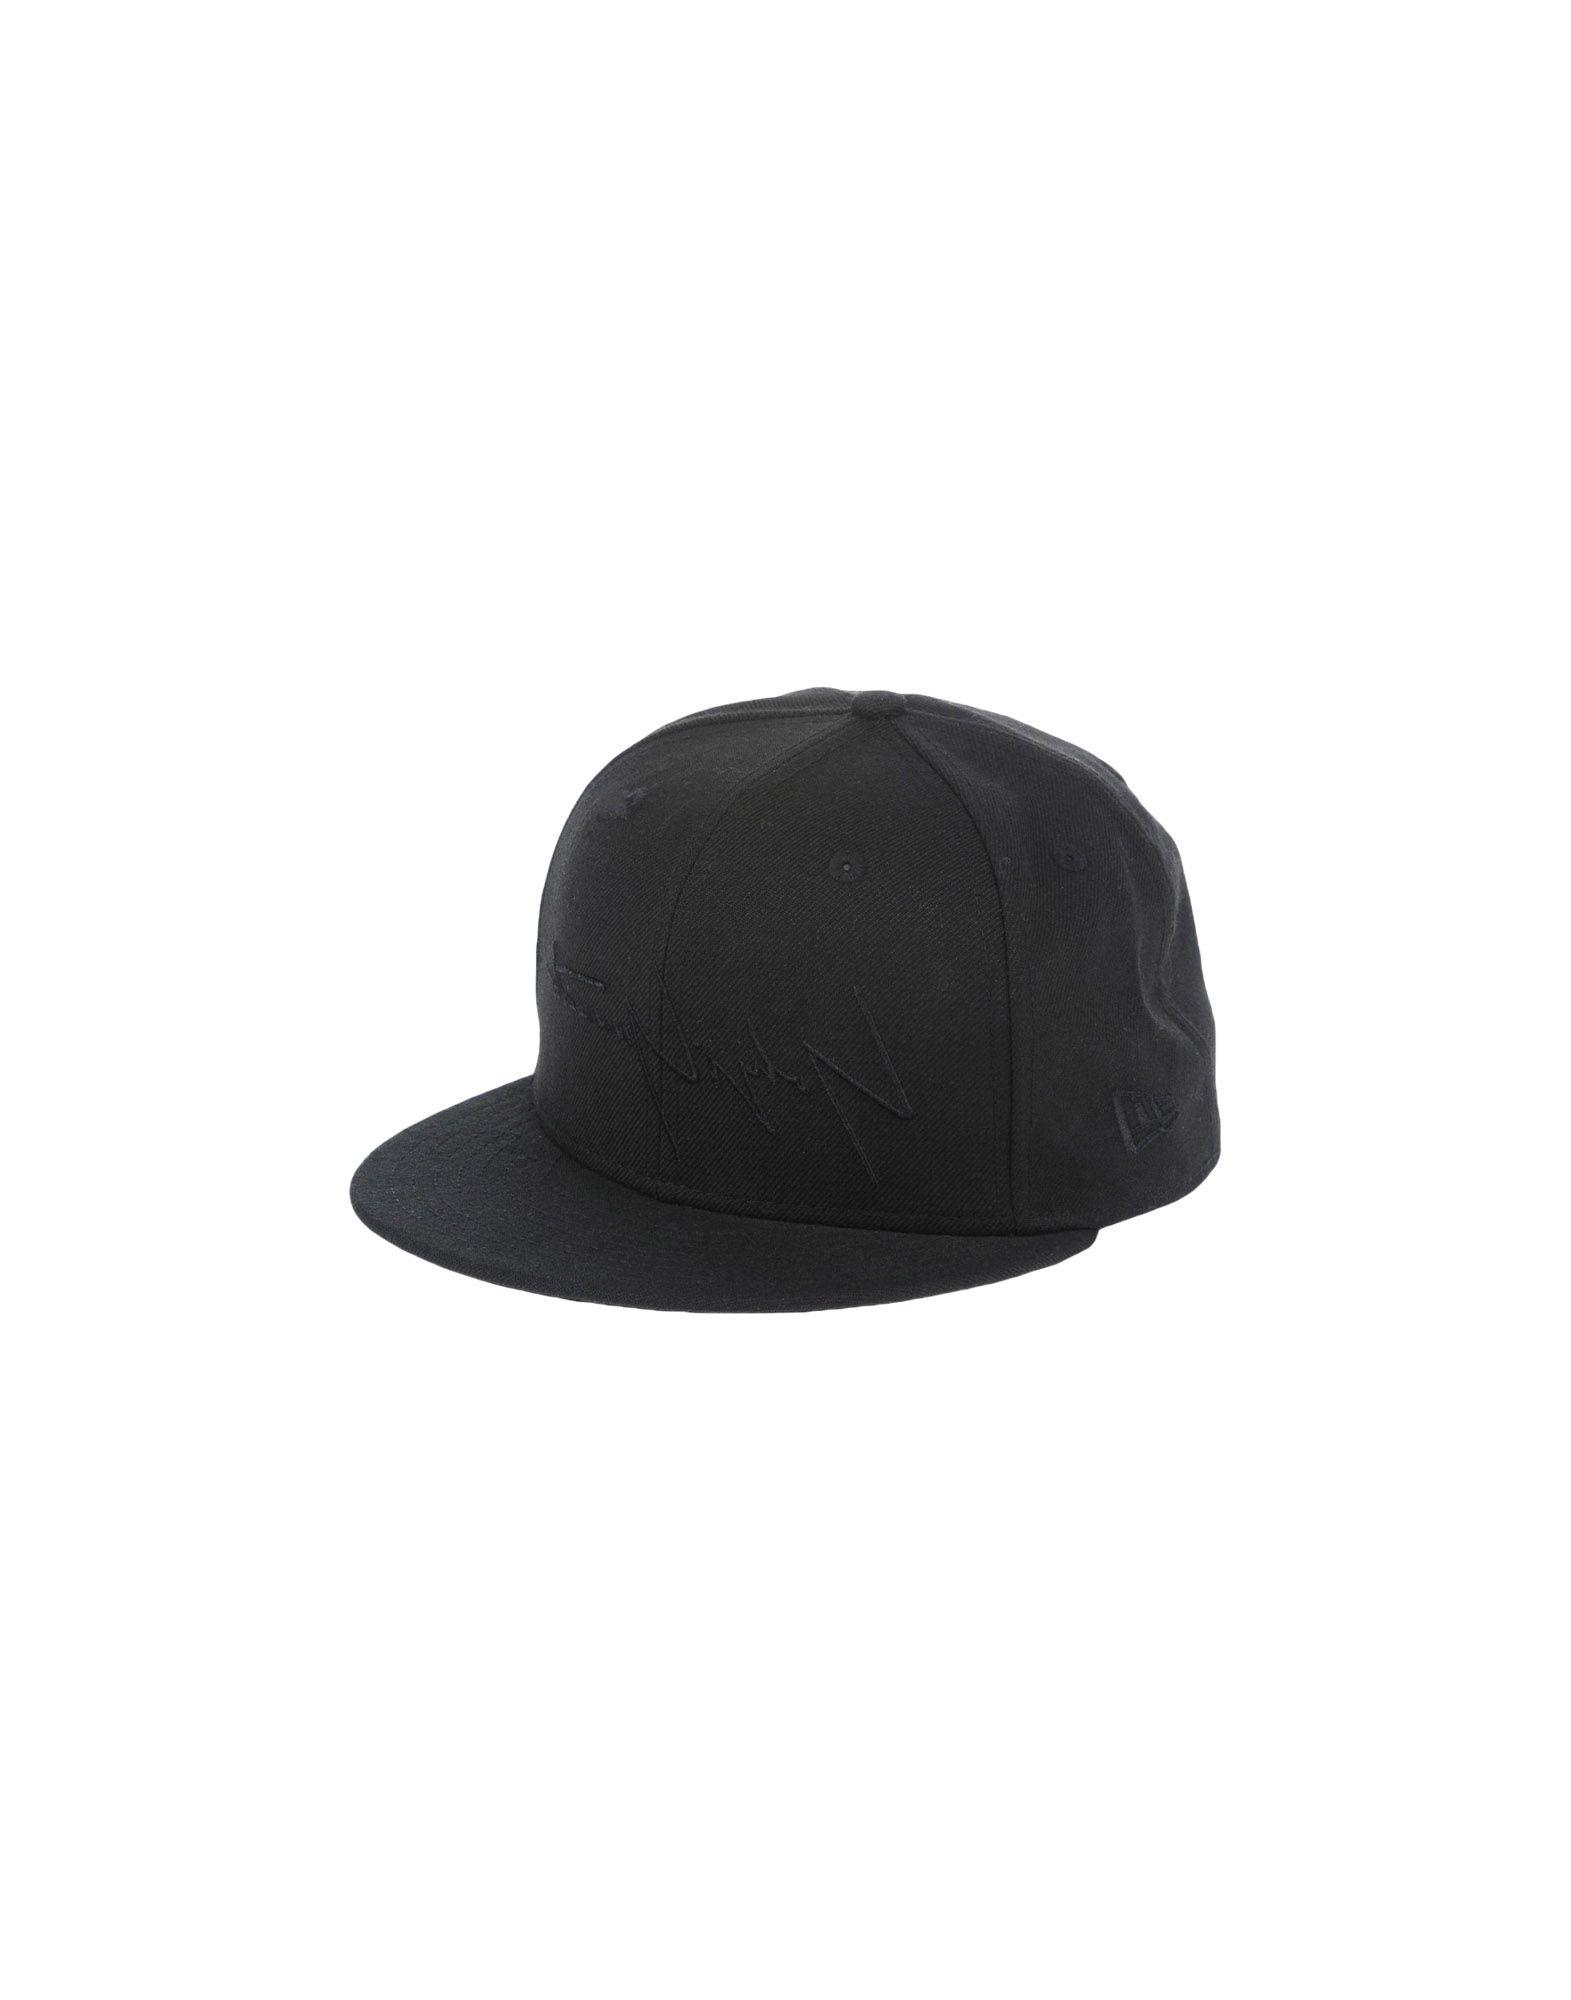 YOHJI YAMAMOTO POUR HOMME Hat in Black